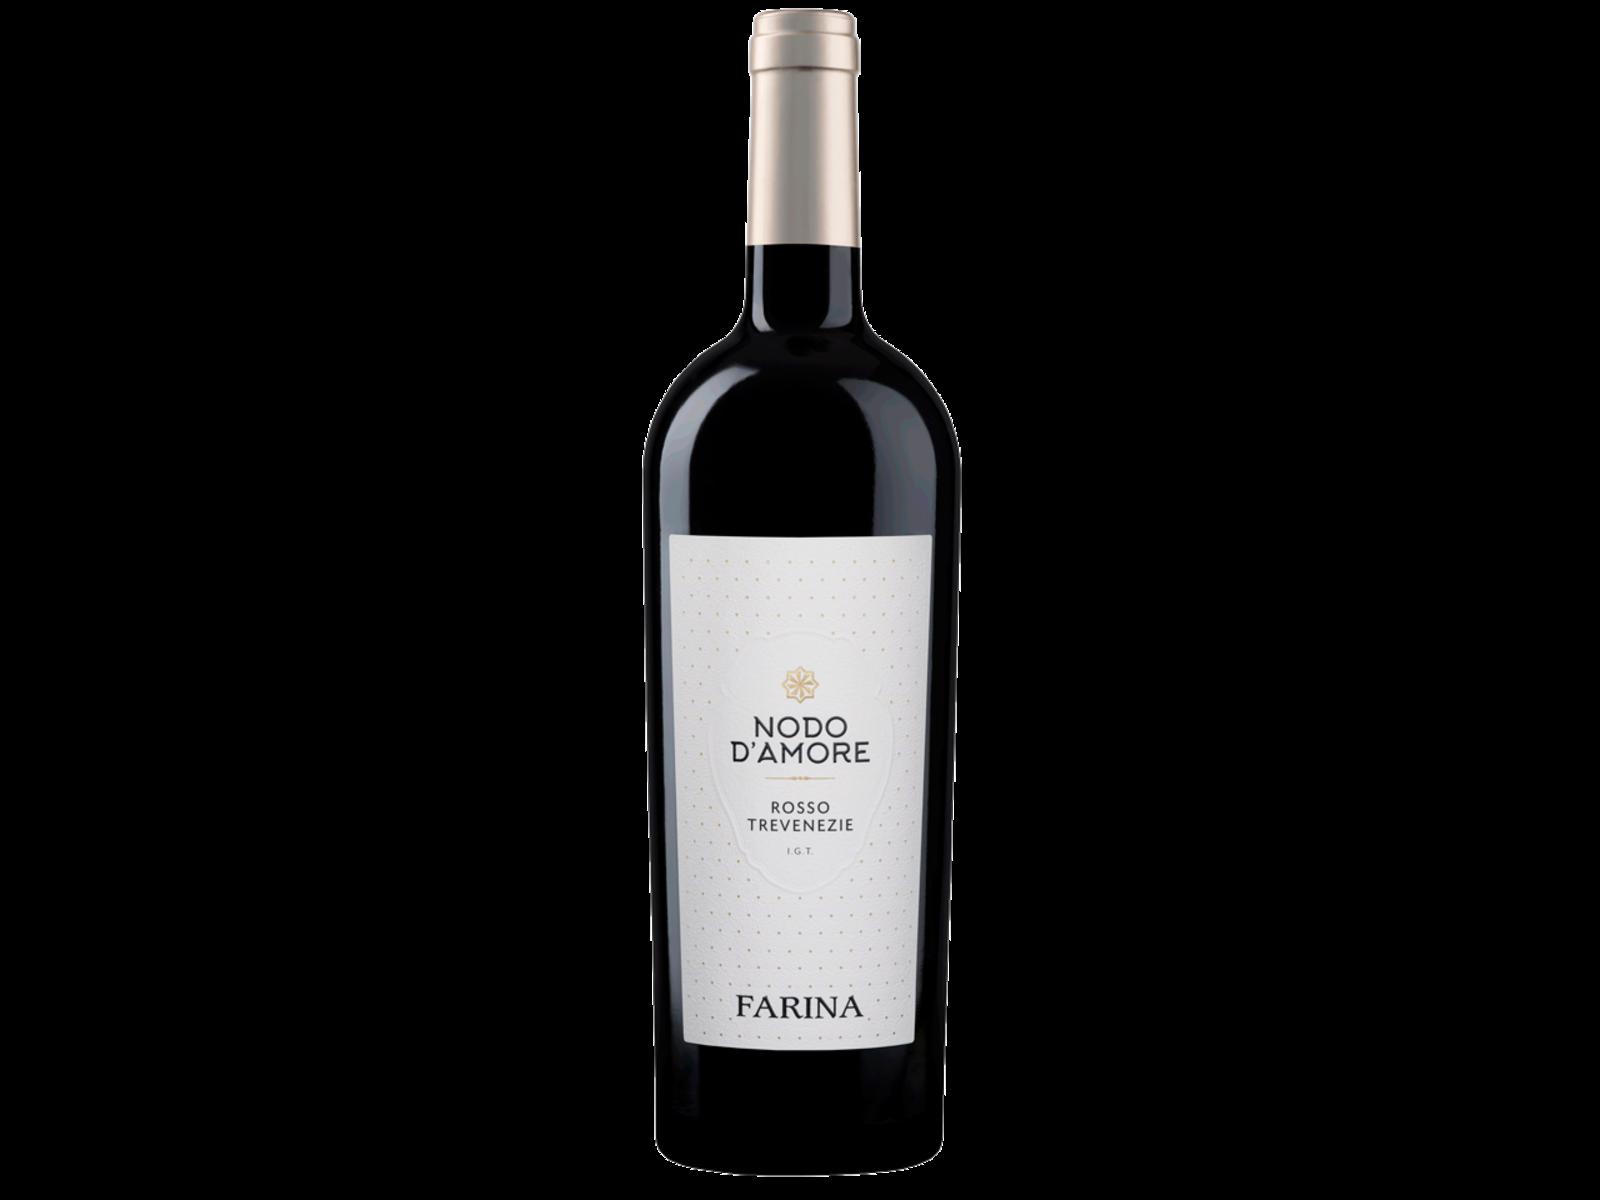 Farina Farina / Nodo D' Amore / Rosso Trevenezie